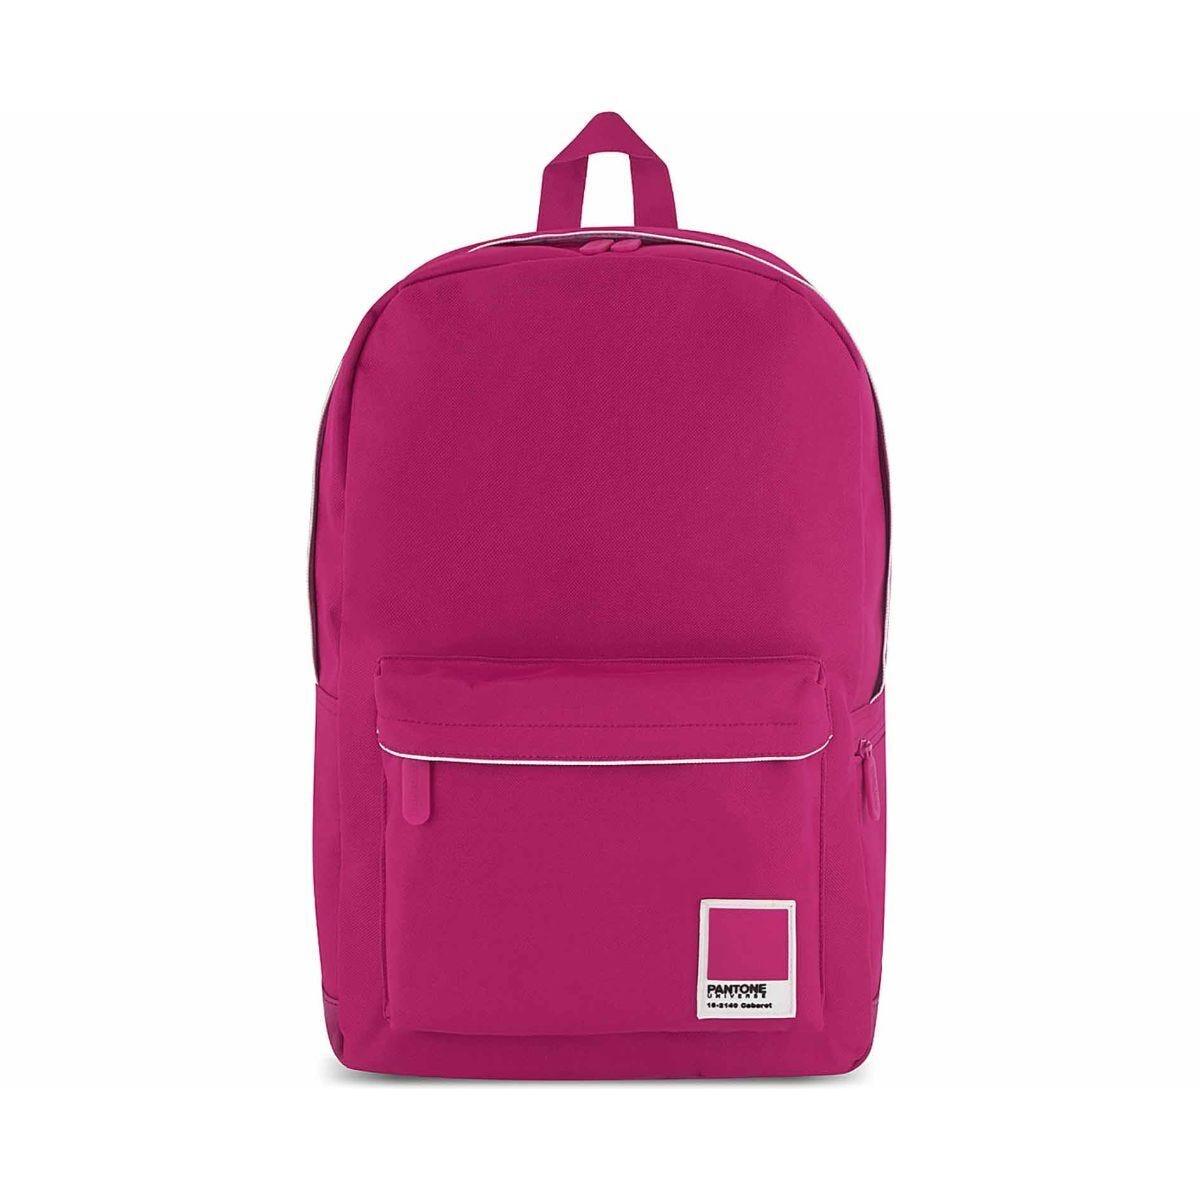 Pantone Laptop Backpack Large Cabaret